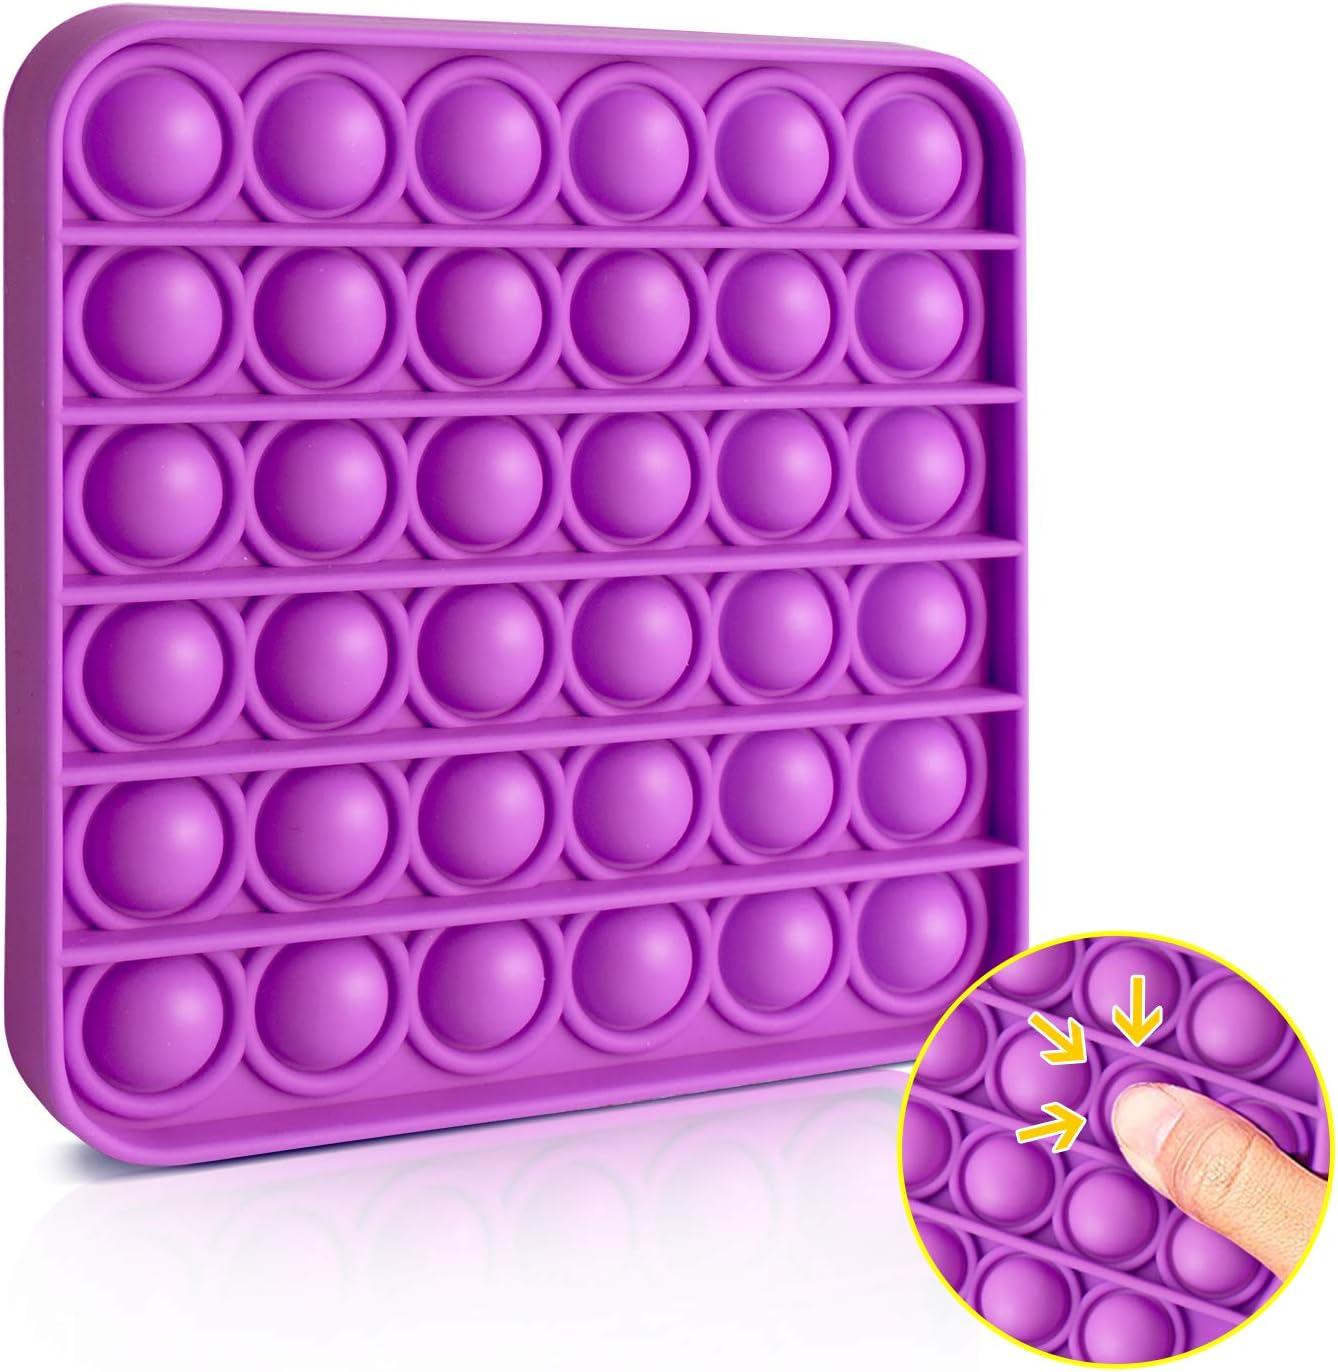 VCOSTORE Pop Pop Bubble Sensory Fidget Toys Extrusion Bubble Fidget Sensory Toys Estrés Anti-Ansiedad Alivio para niños Adultos